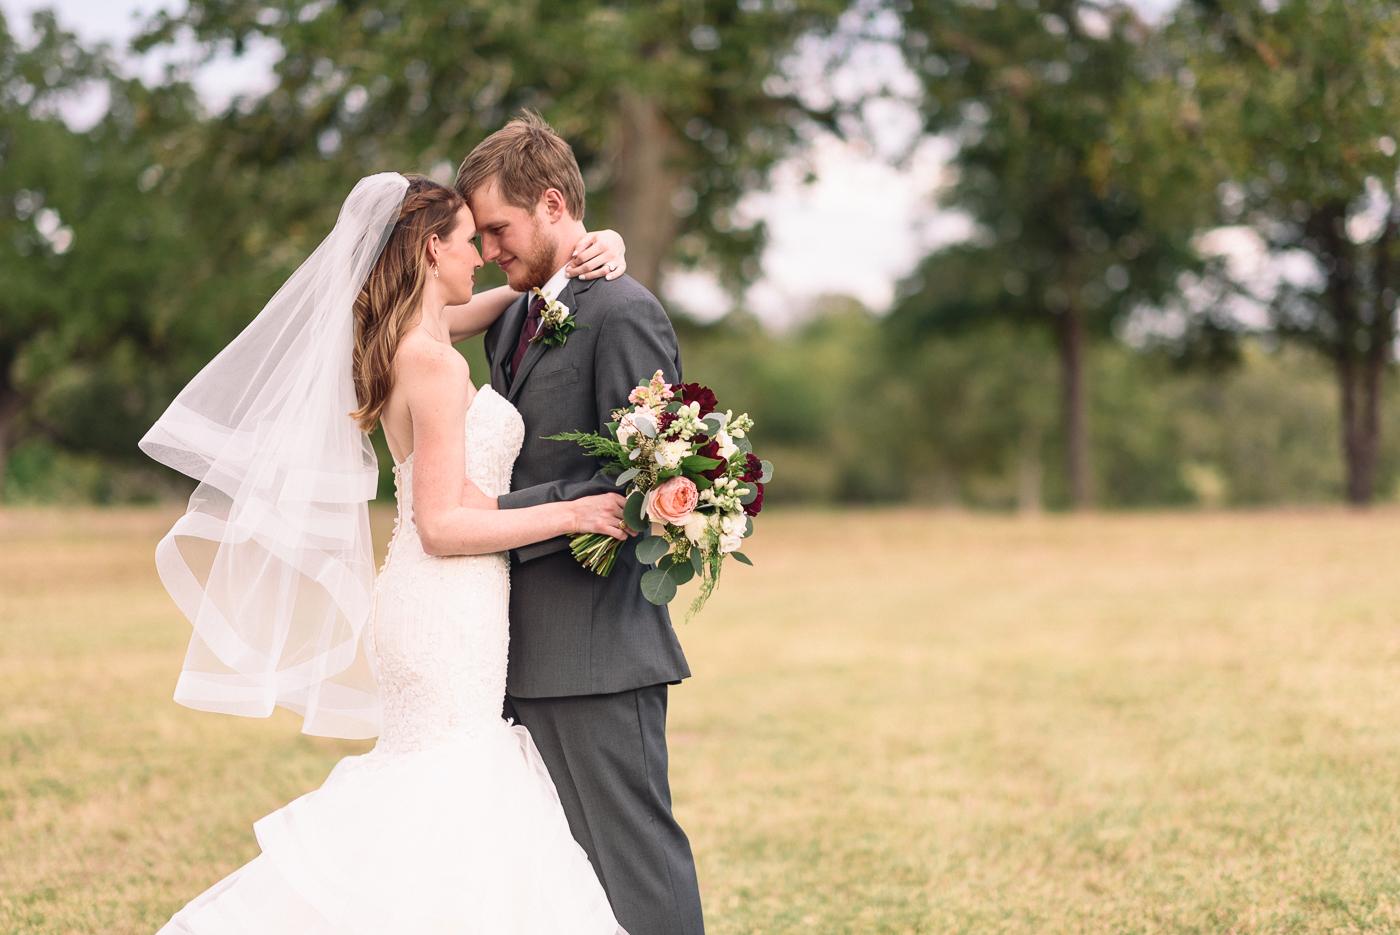 husband and wife wedding portrait wedding bouquet